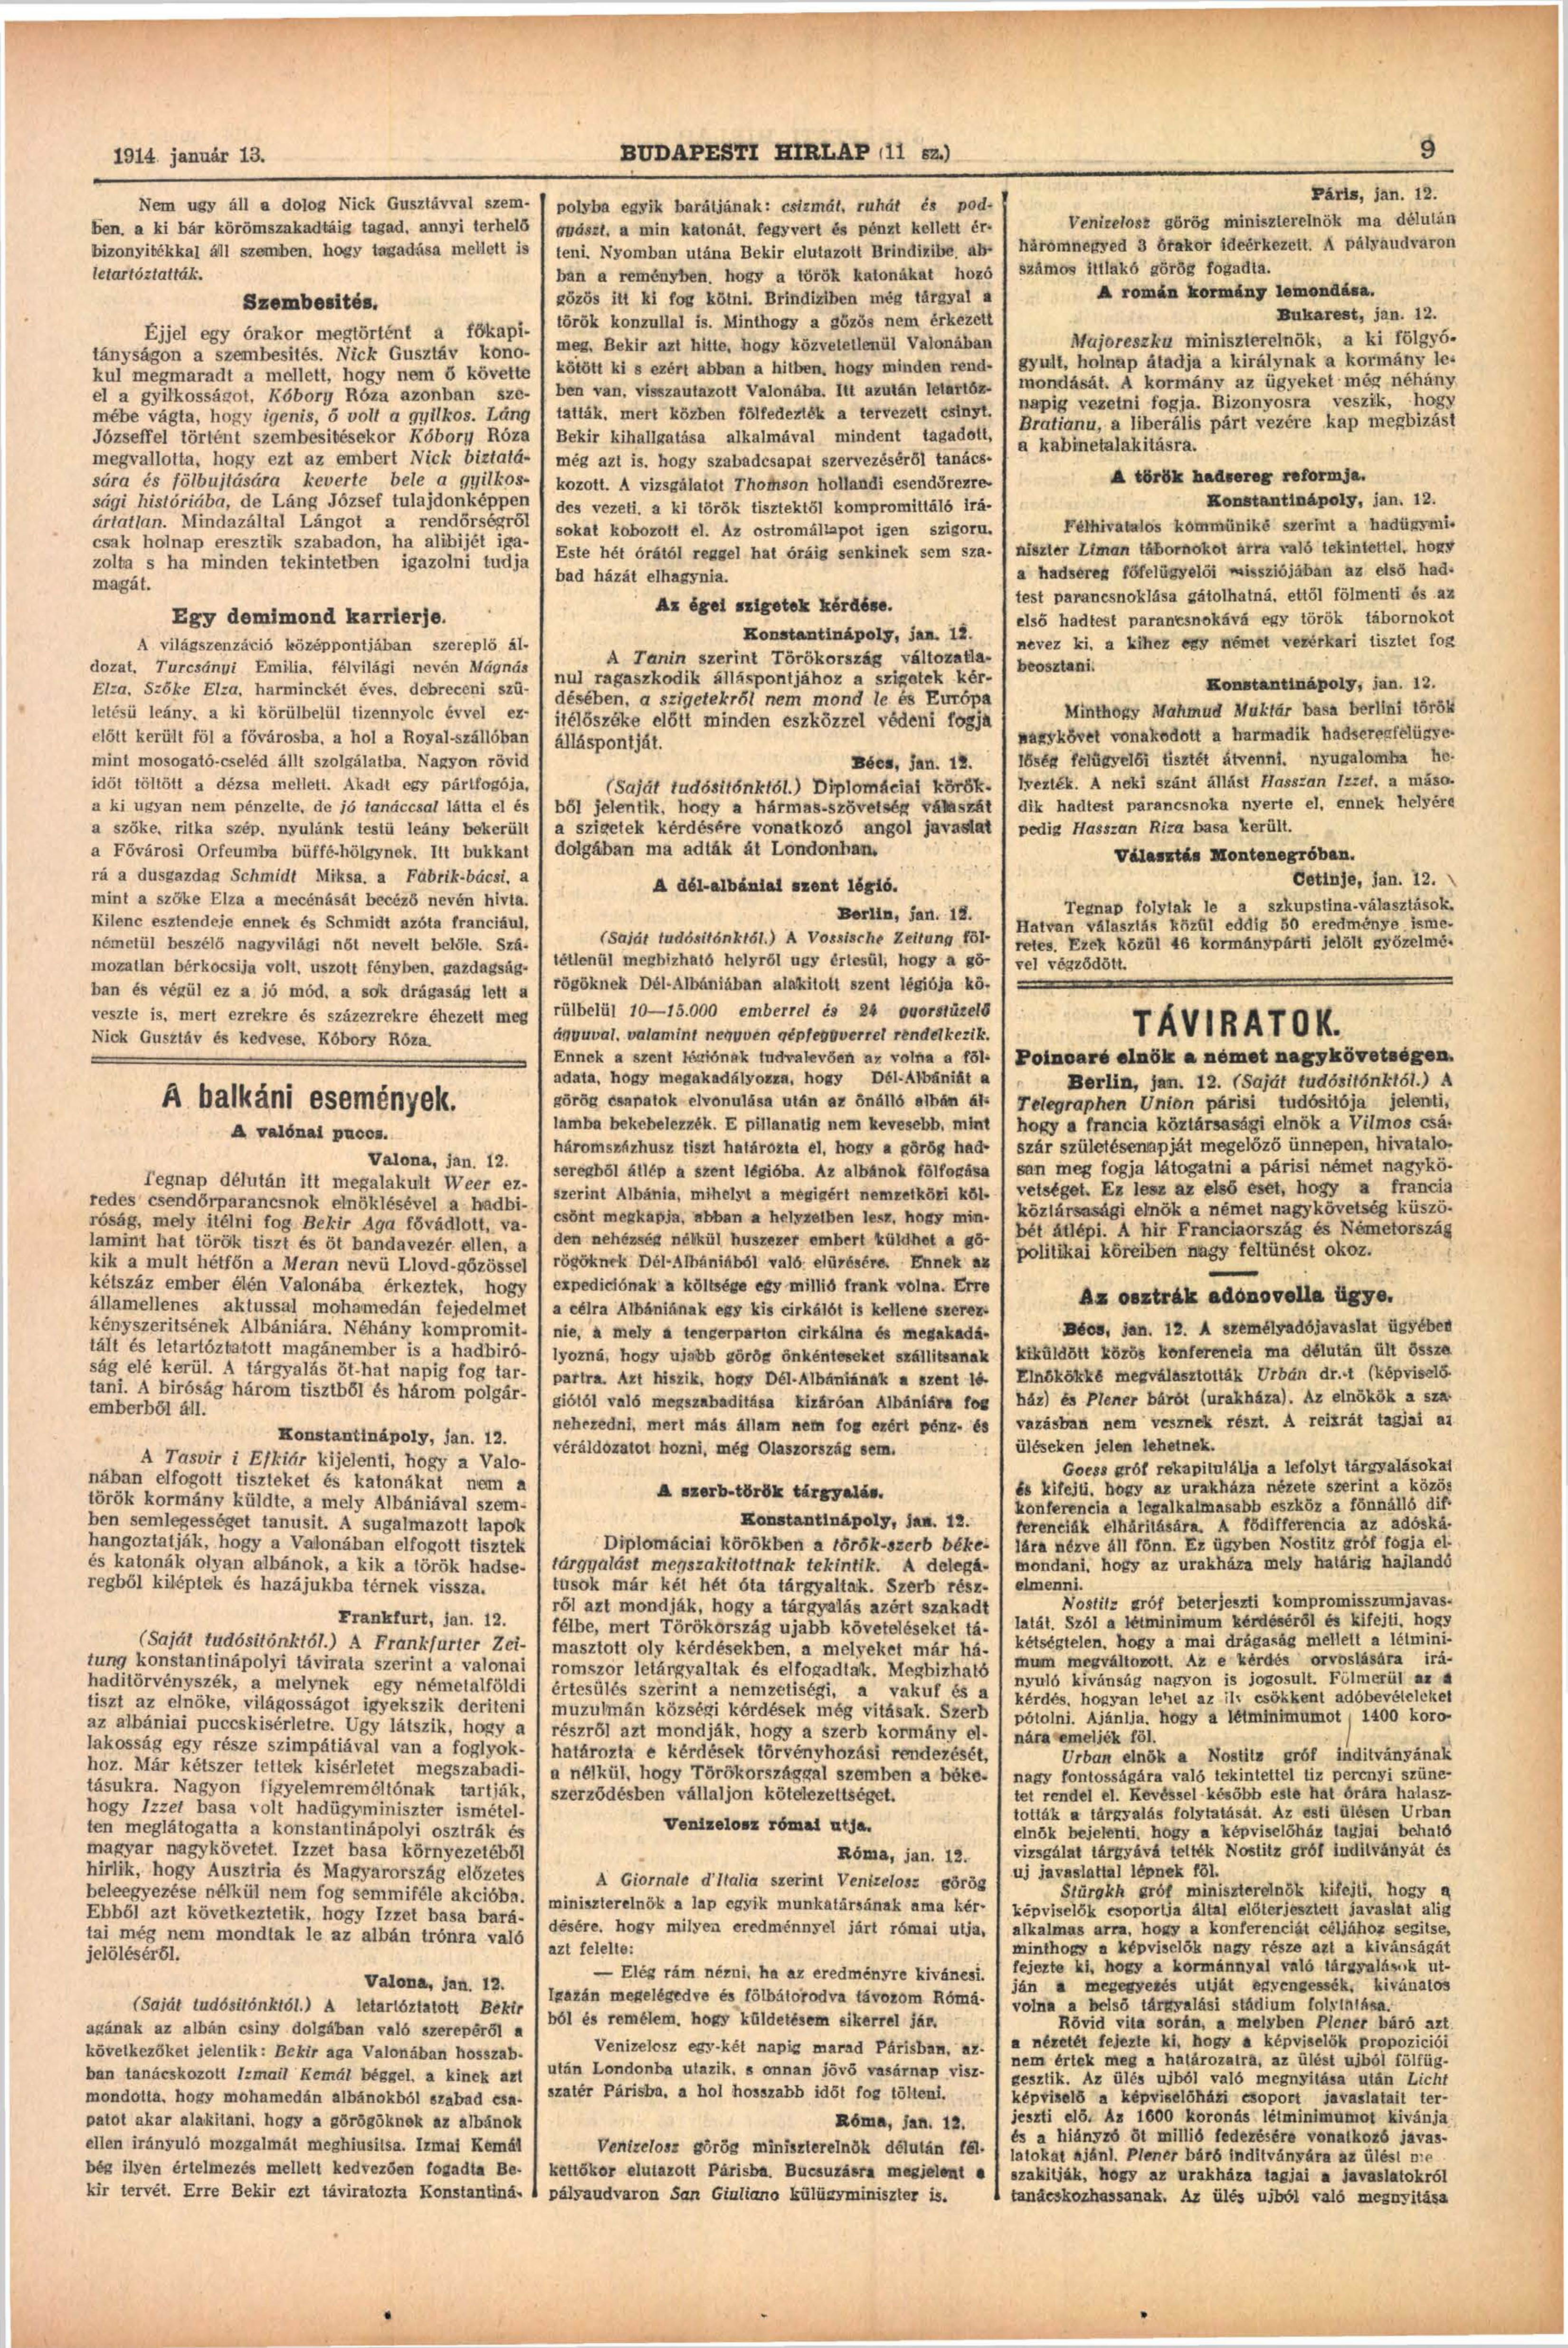 budapestihirlap_1914_01_pages340-340-page-0.jpg